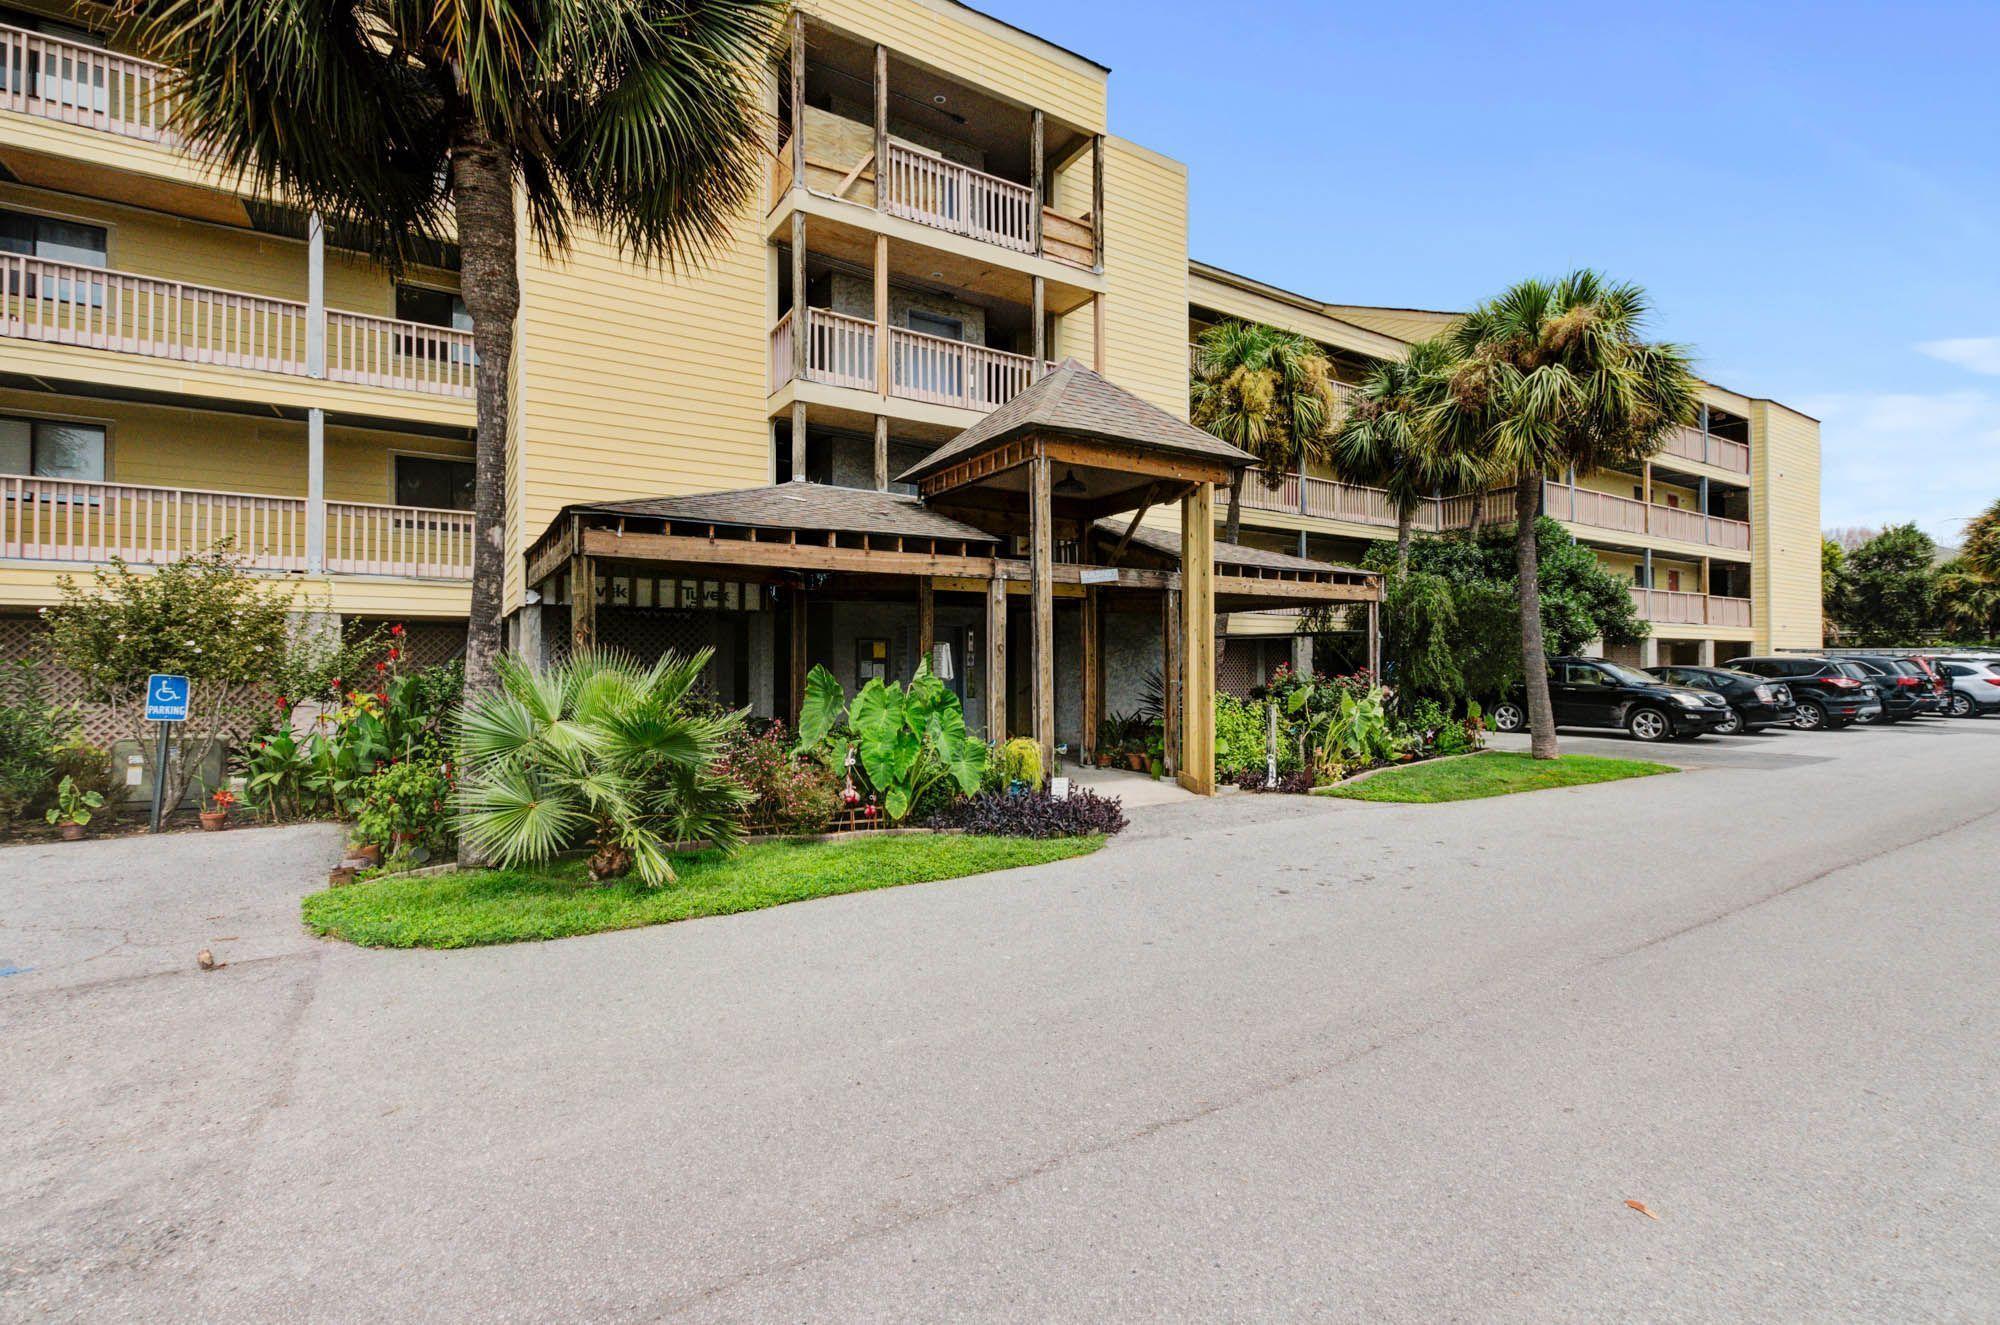 151 W Marsh View Villas Drive Folly Beach, SC 29439